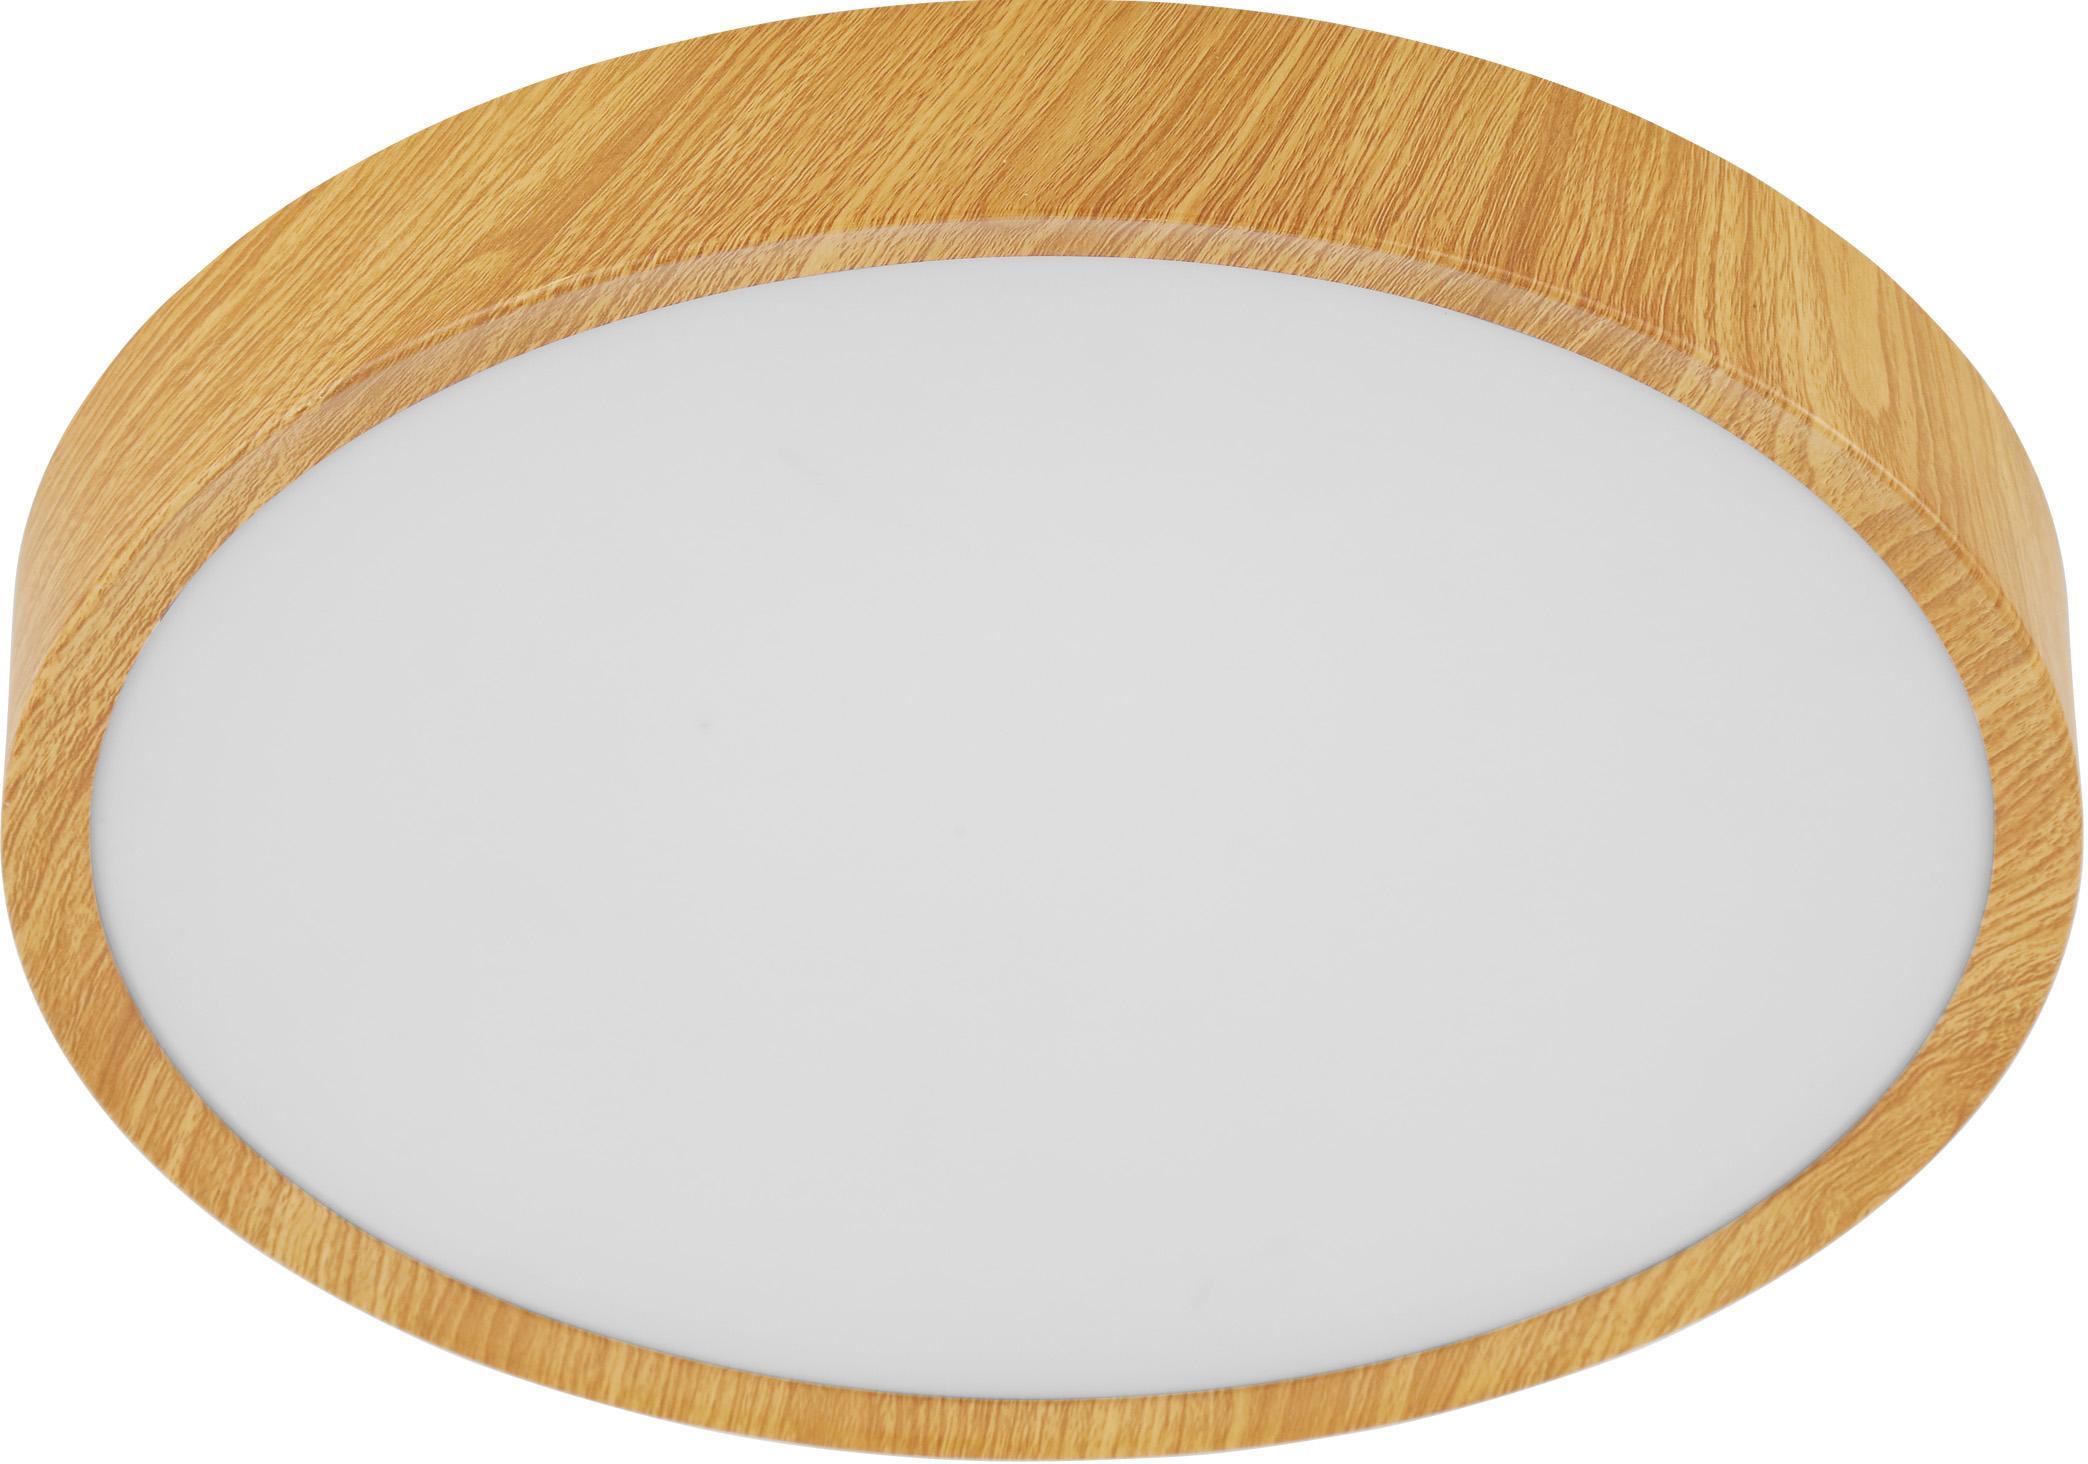 LED-Deckenleuchte Musurita in Holzoptik, Lampenschirm: Kunststoff, Baldachin: Metall, foliert, Braun, Ø 34 x H 6 cm